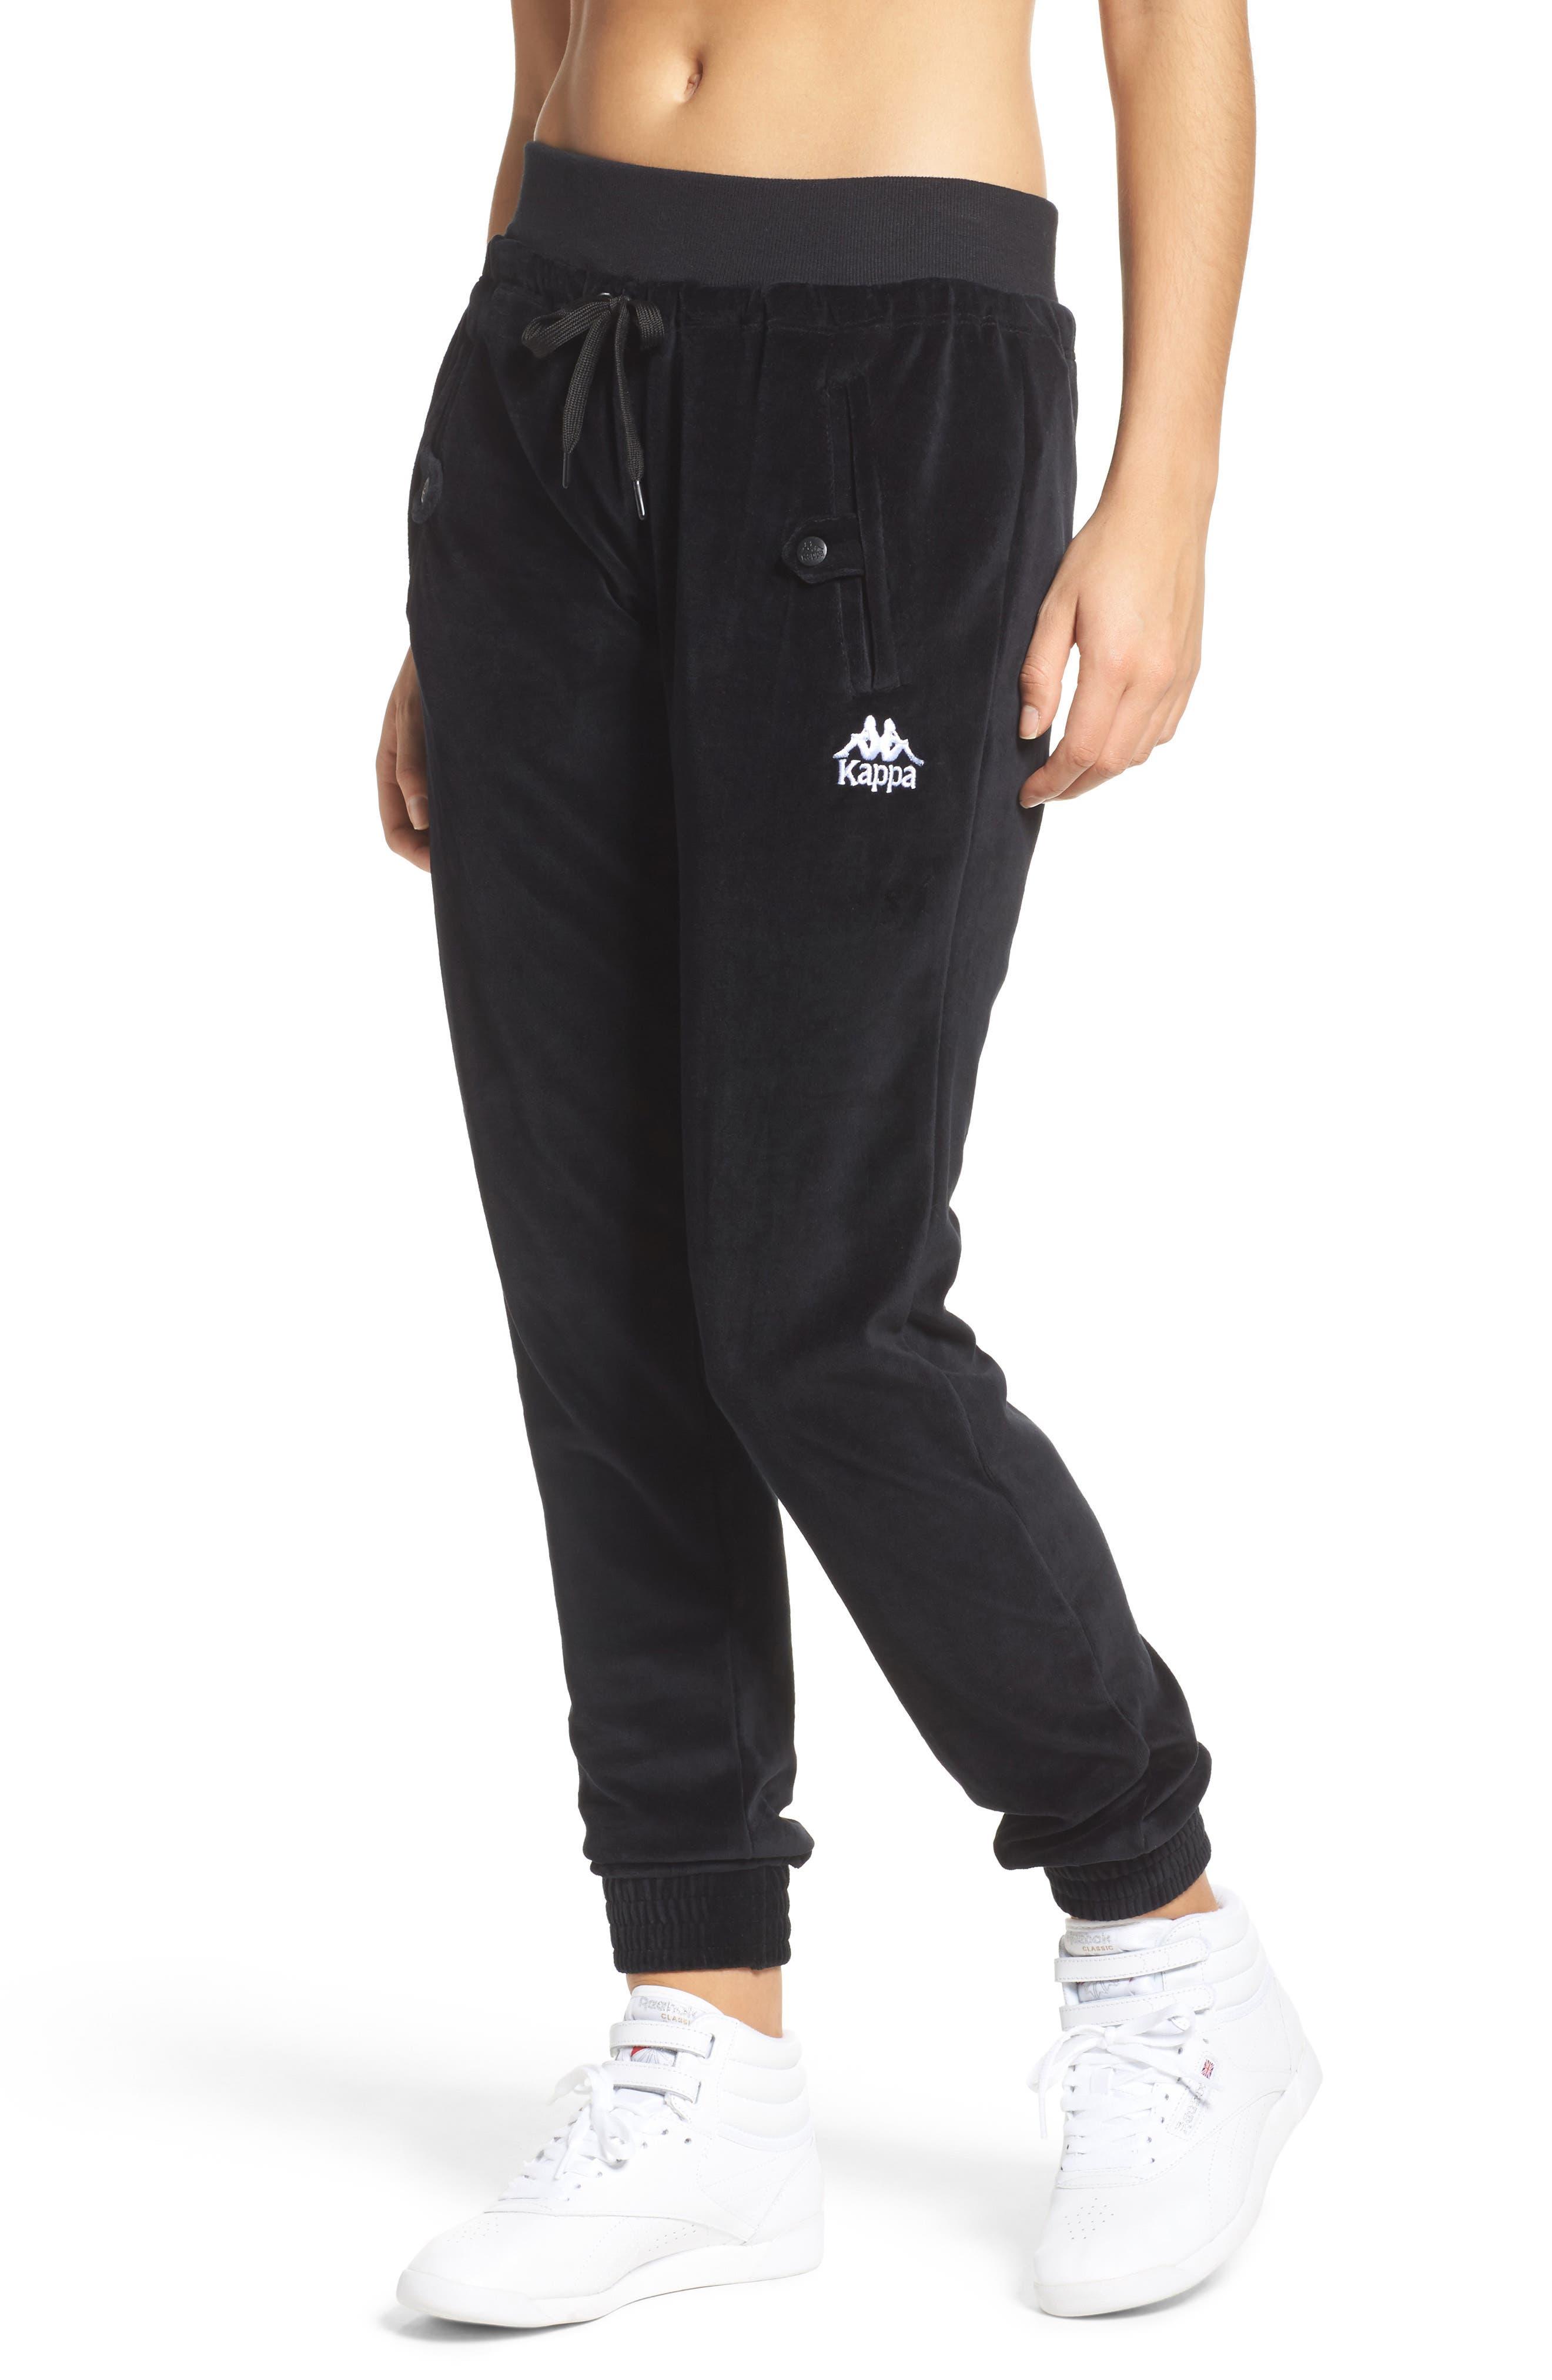 Main Image - Kappa Authentic Screwball Track Pants